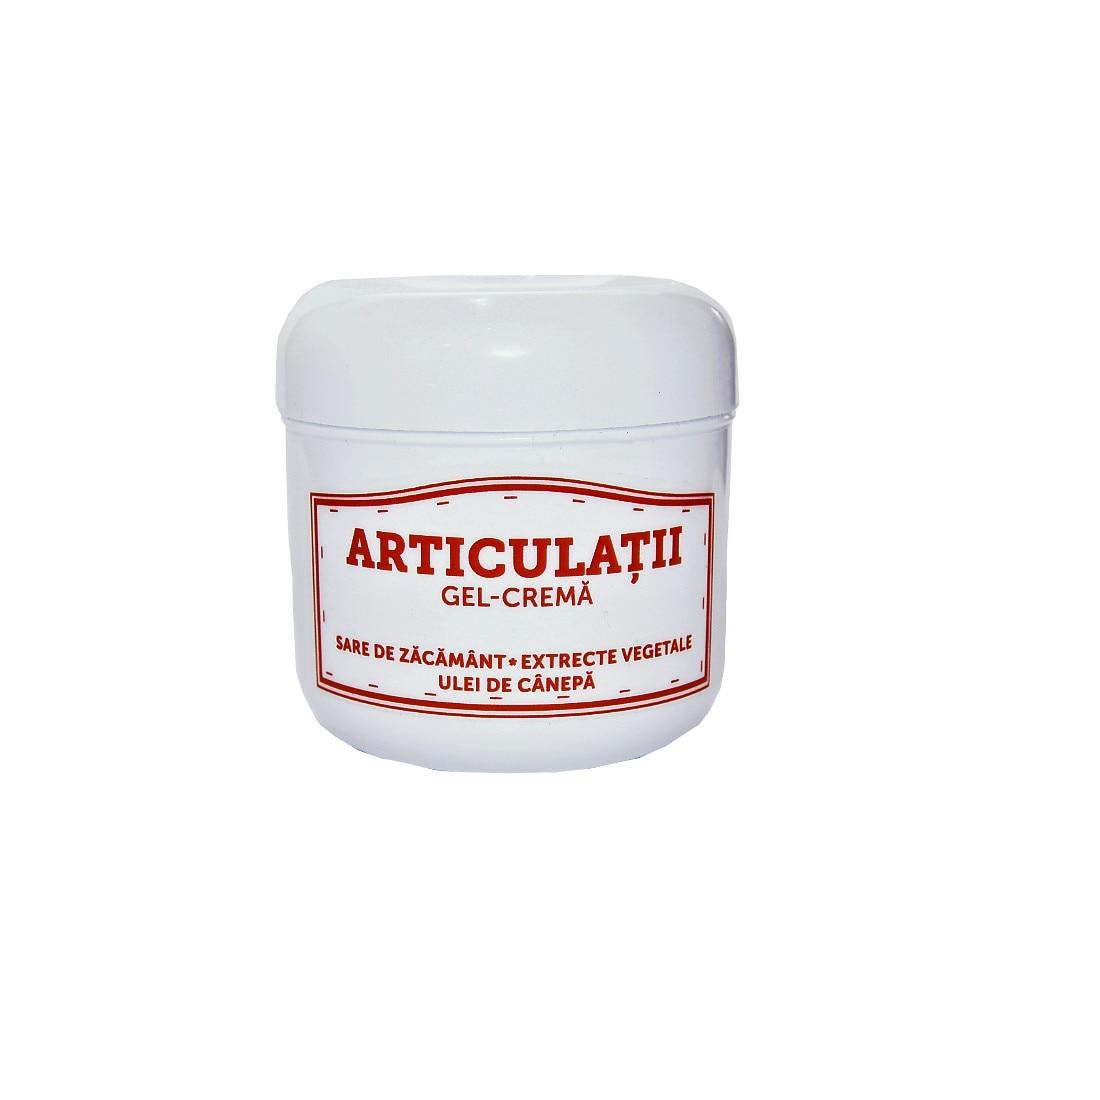 Dureri articulare si musculare - antiinflamatoare